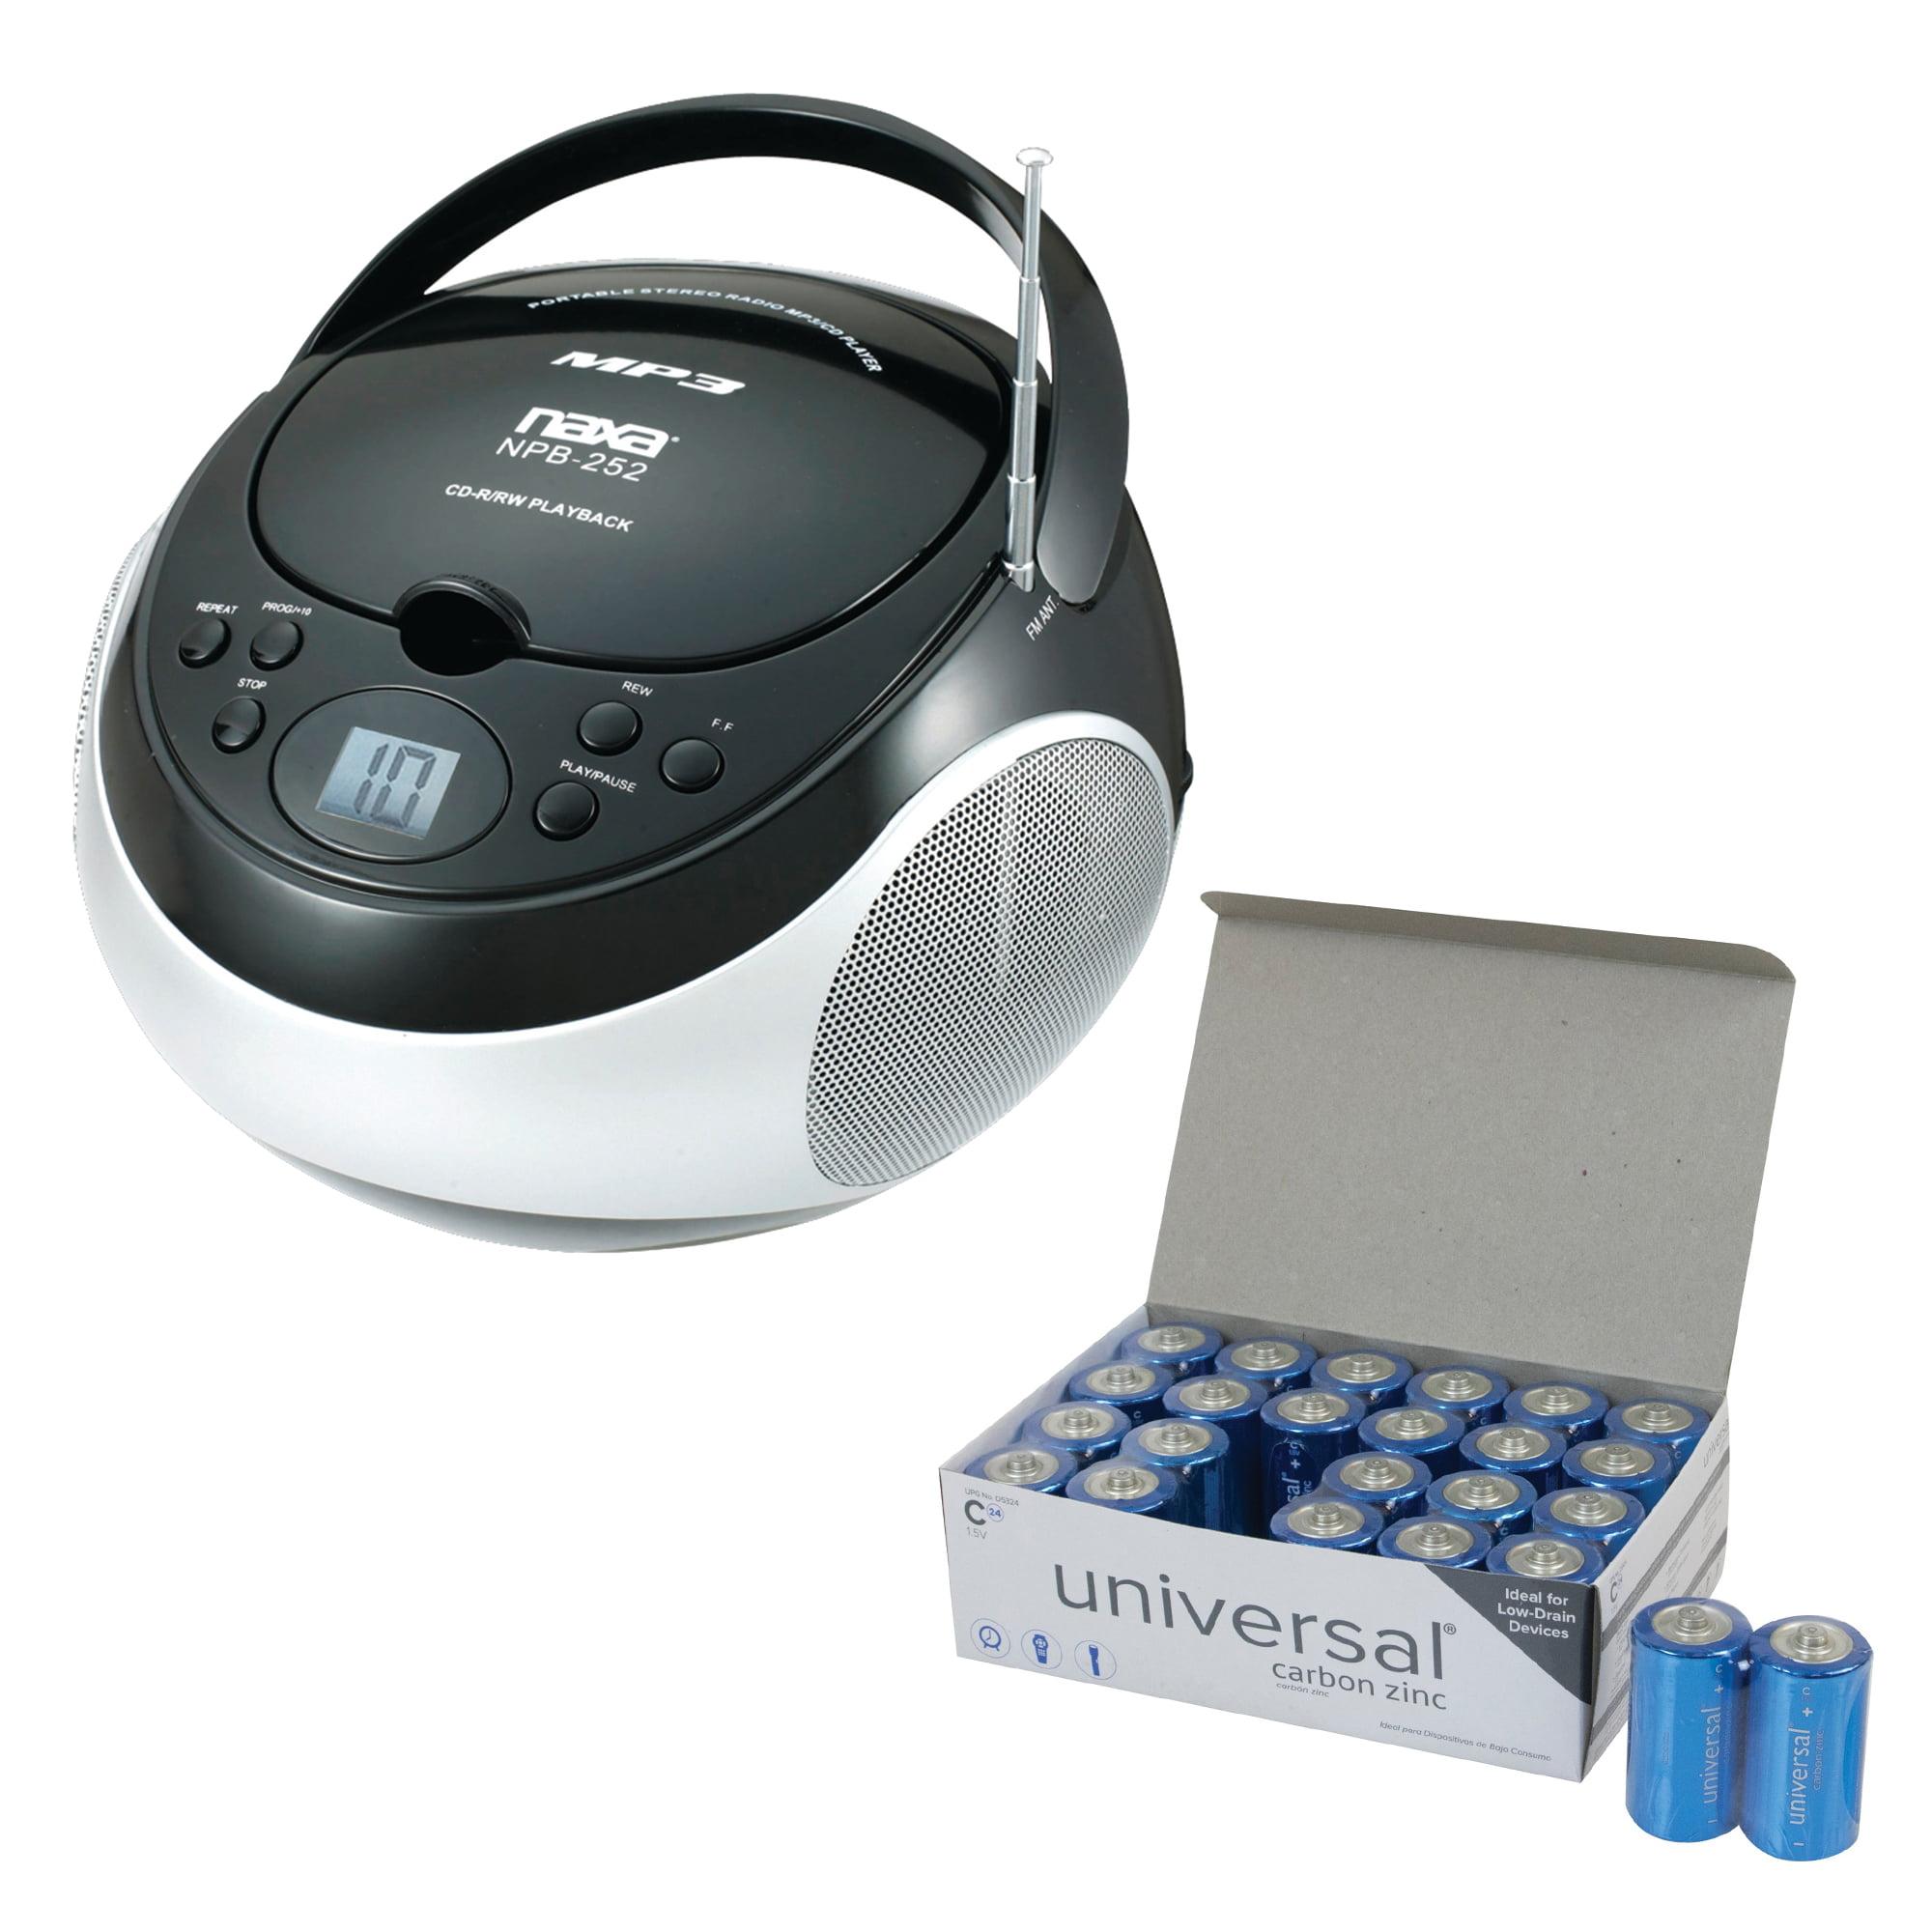 Naxa NPB252BK Portable CD/MP3 Players With AM/FM Stereo (Black) & UPG C 24 PACK